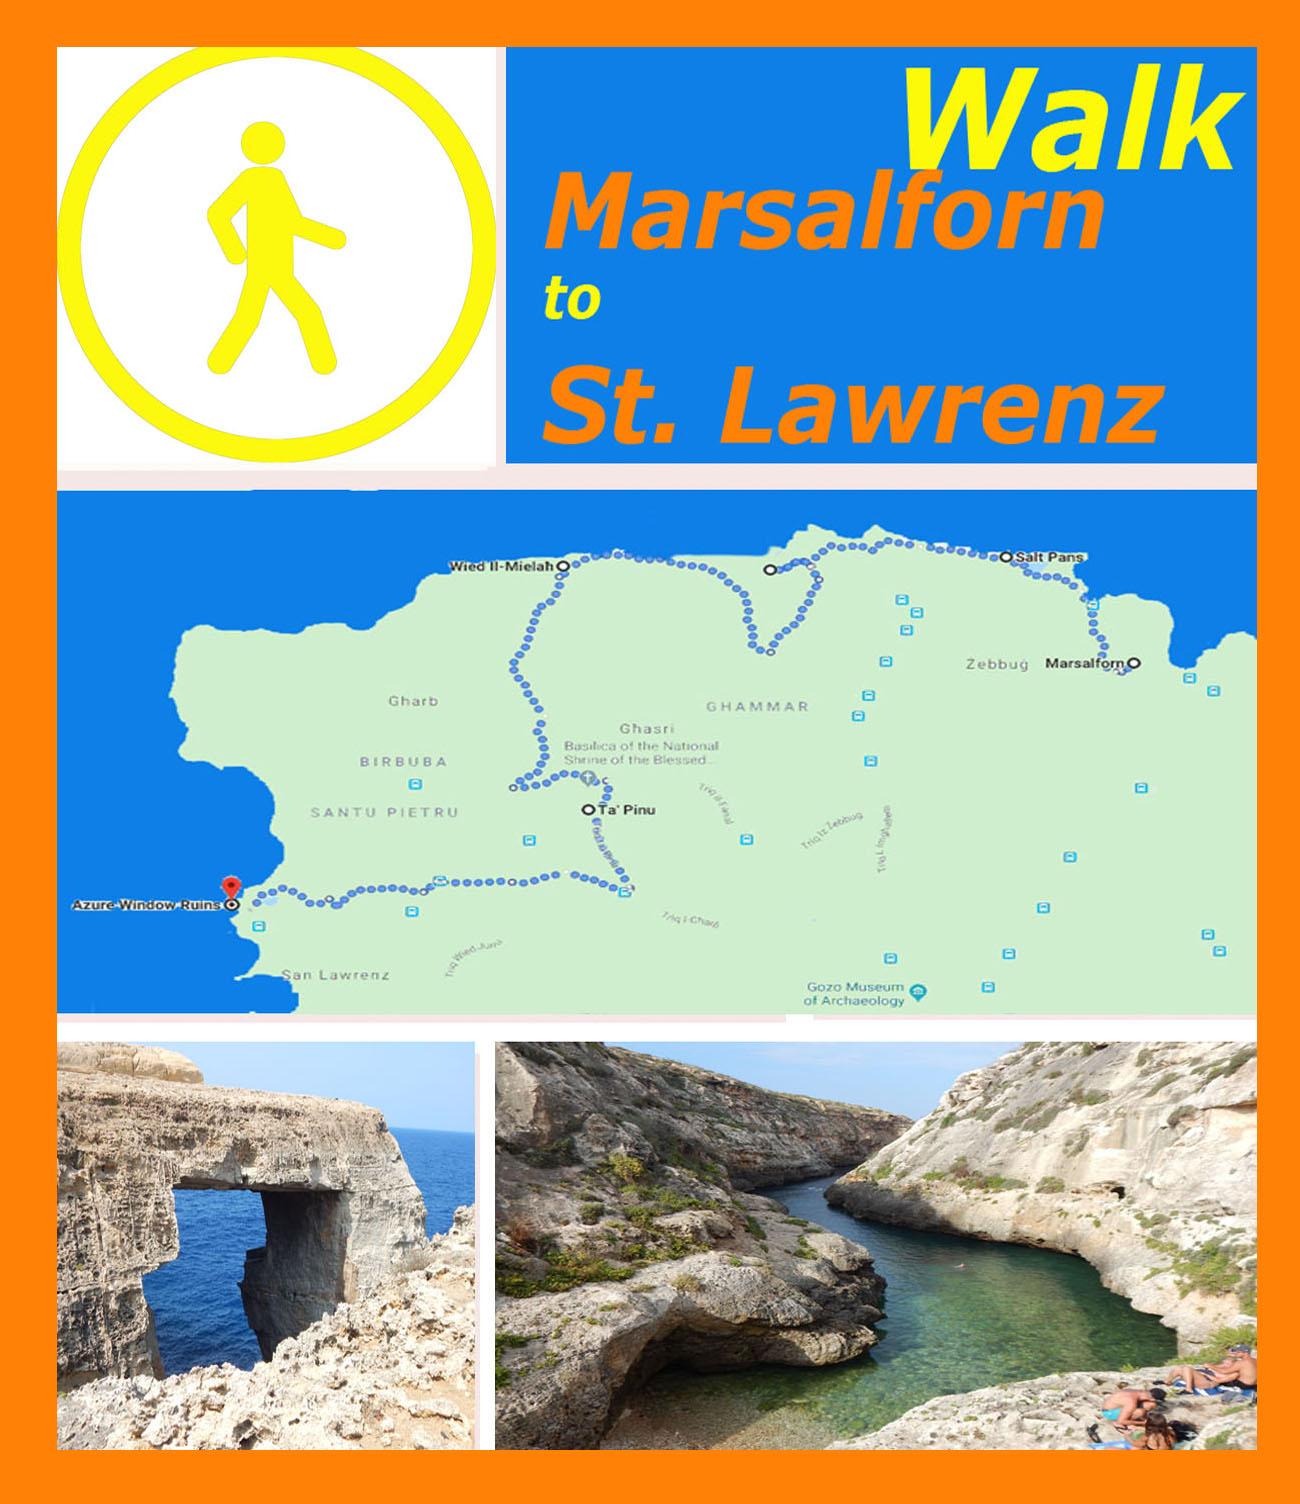 Passeggiata a Gozo: da Marsalforn a San Lorenzo